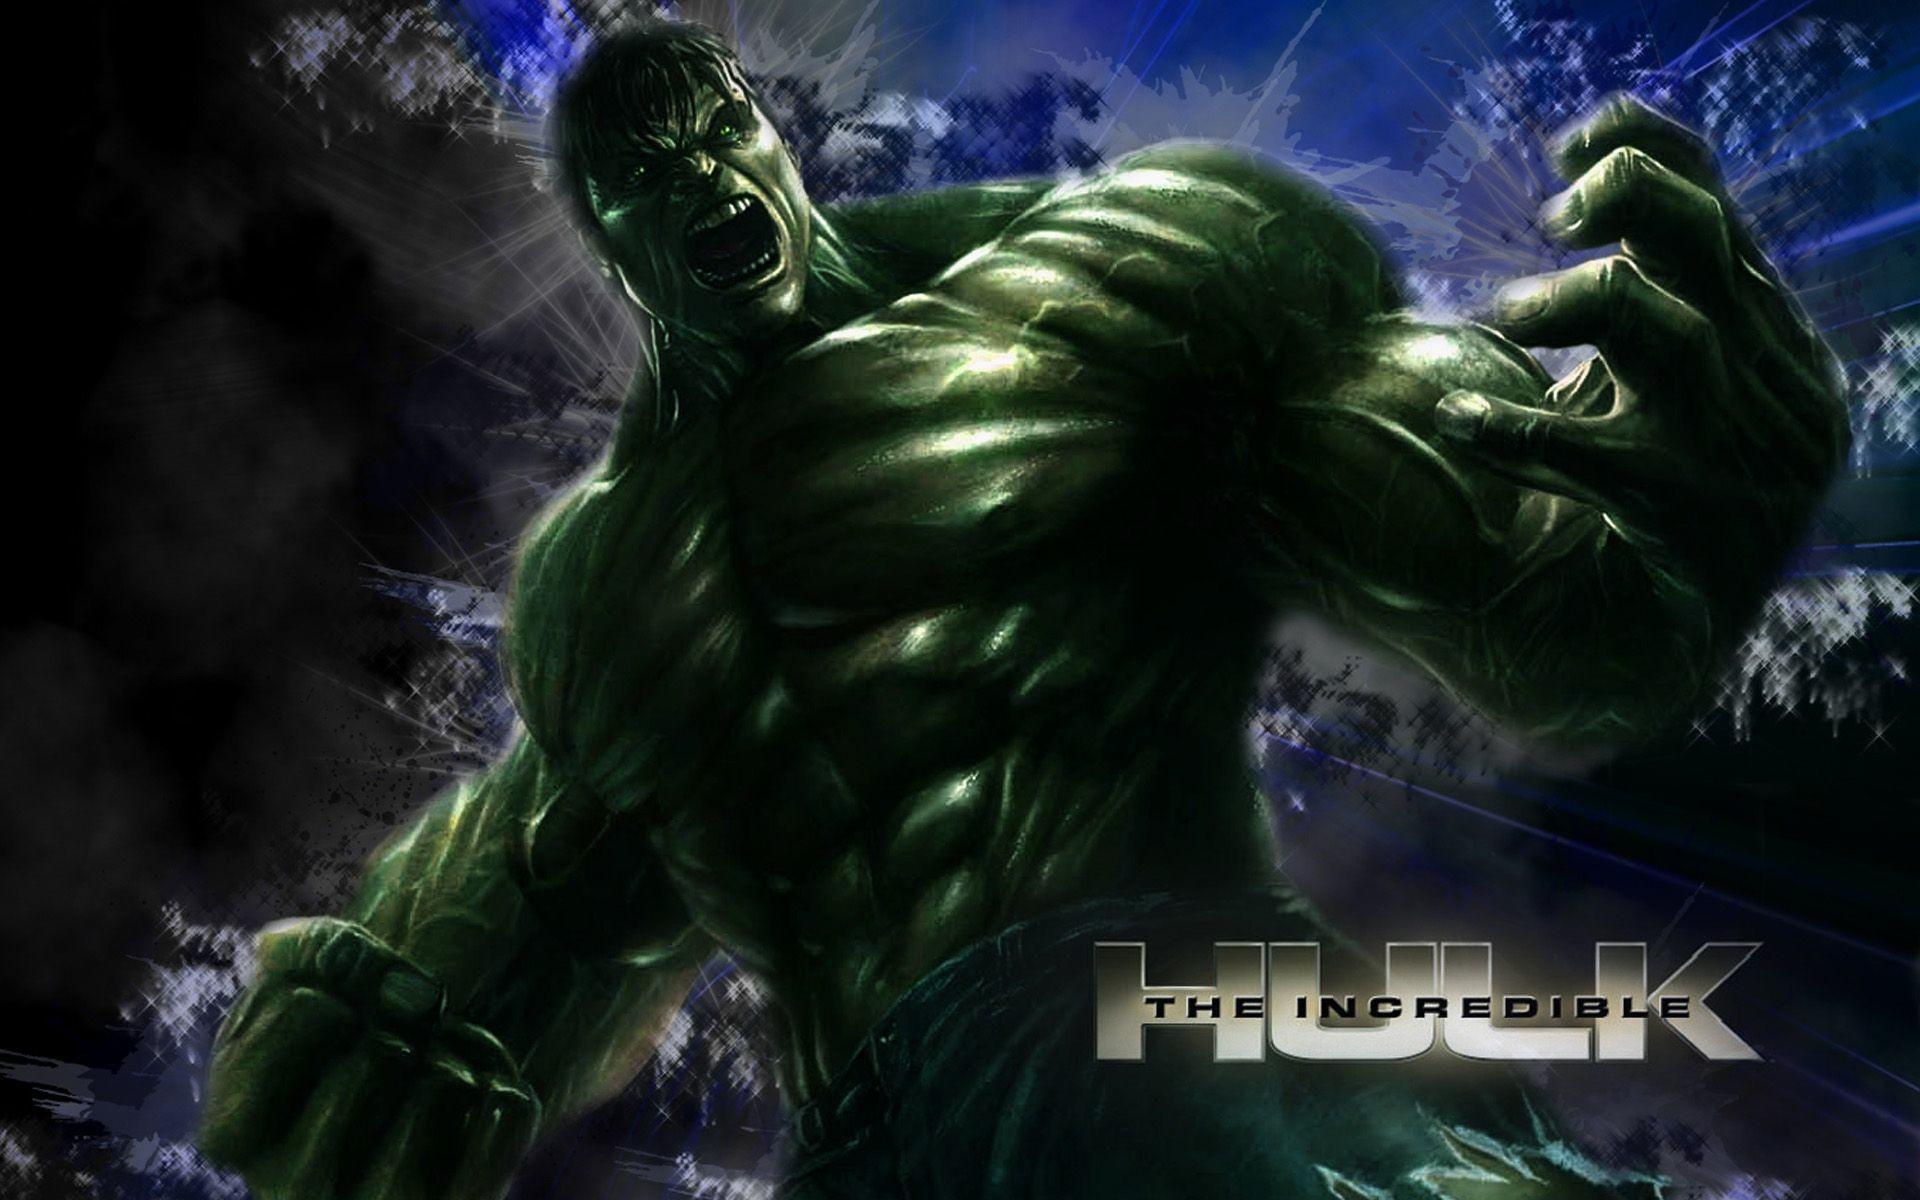 hulk-hd-wallpaper.jpg (1920×1200) | Gabbo's Shit |